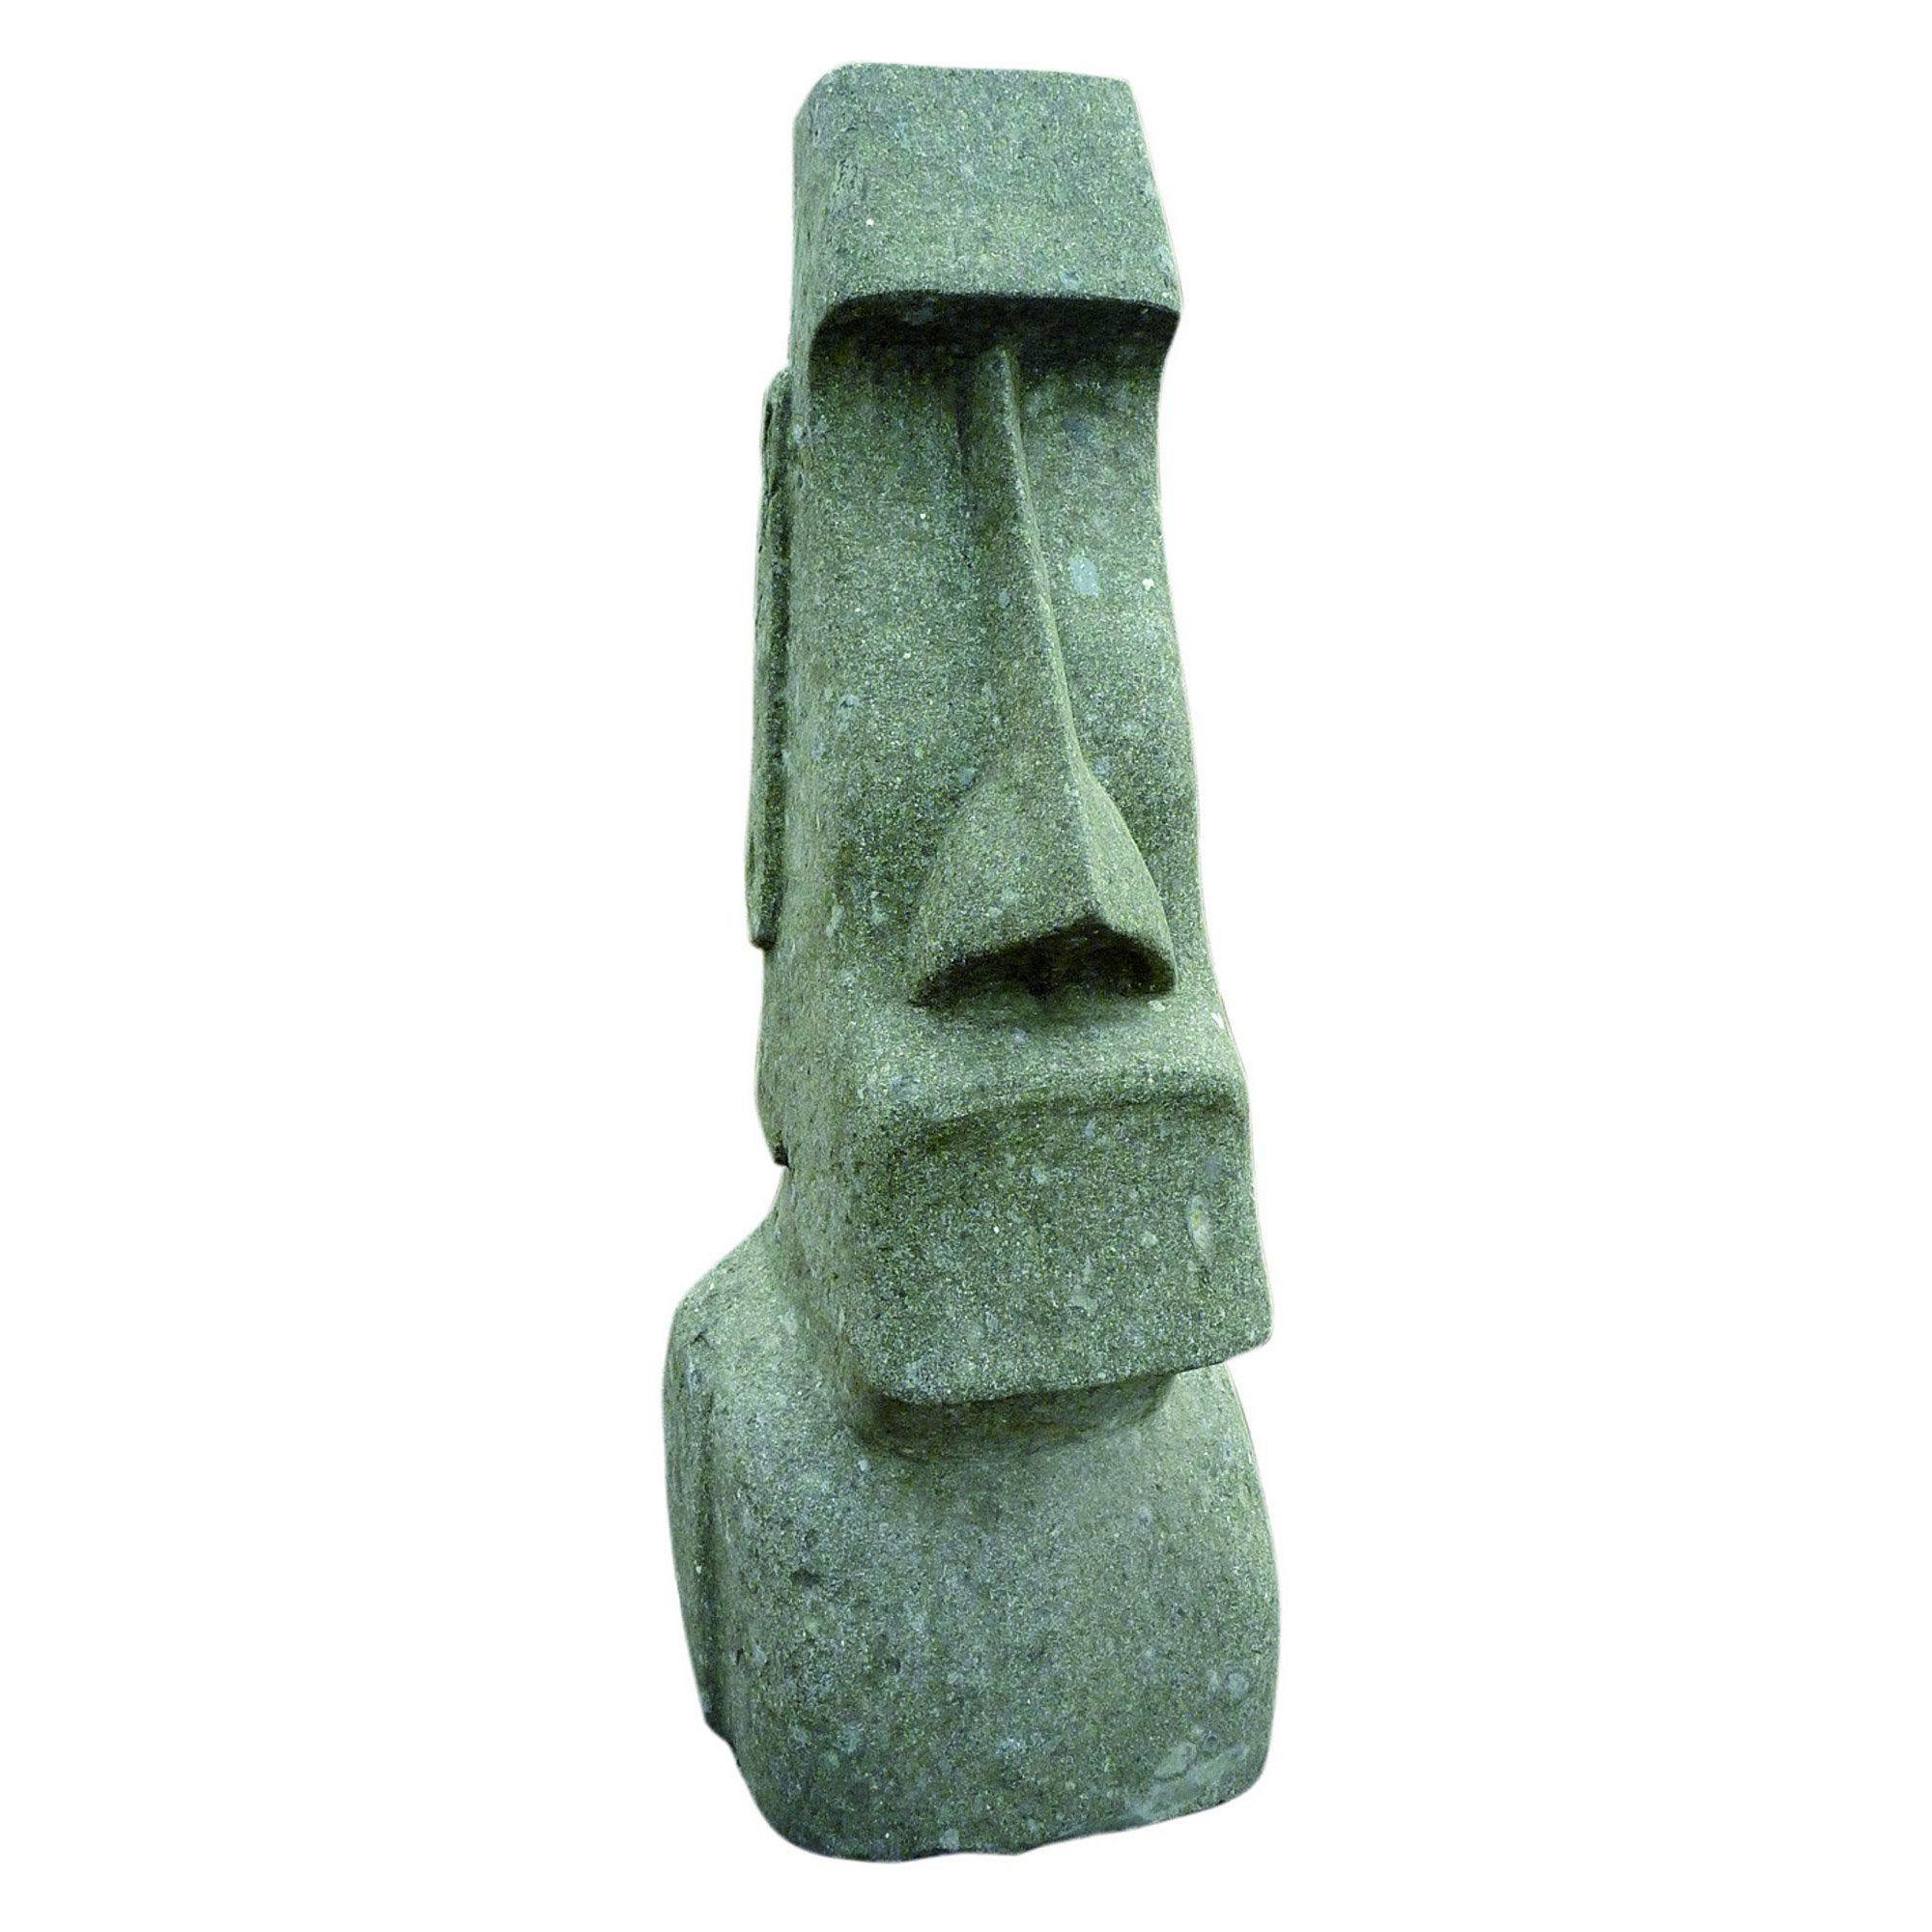 Decoration De Jardin Statue Moai Taillee Dans Basanite Naturelle